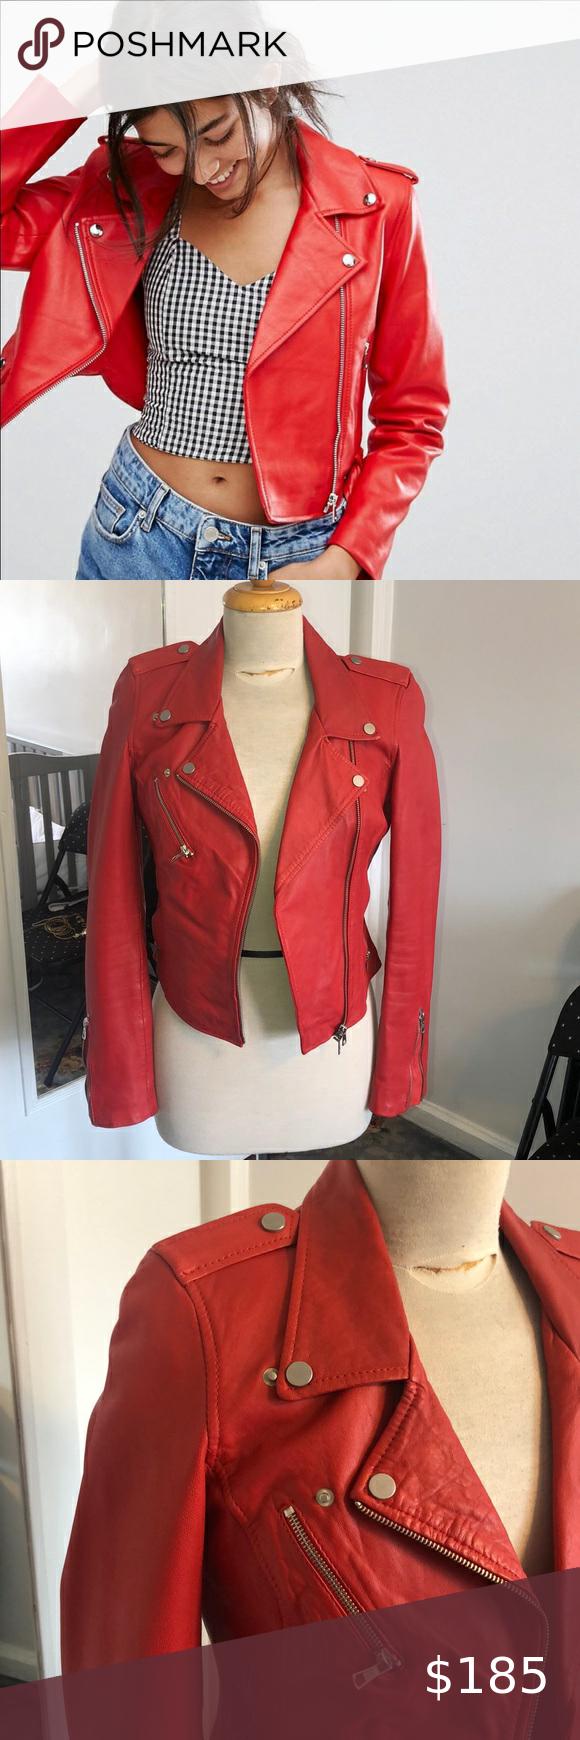 Zara Red Leather Jacket Zara Leather Jacket Cropped Faux Leather Jacket Red Leather Jacket [ 1740 x 580 Pixel ]